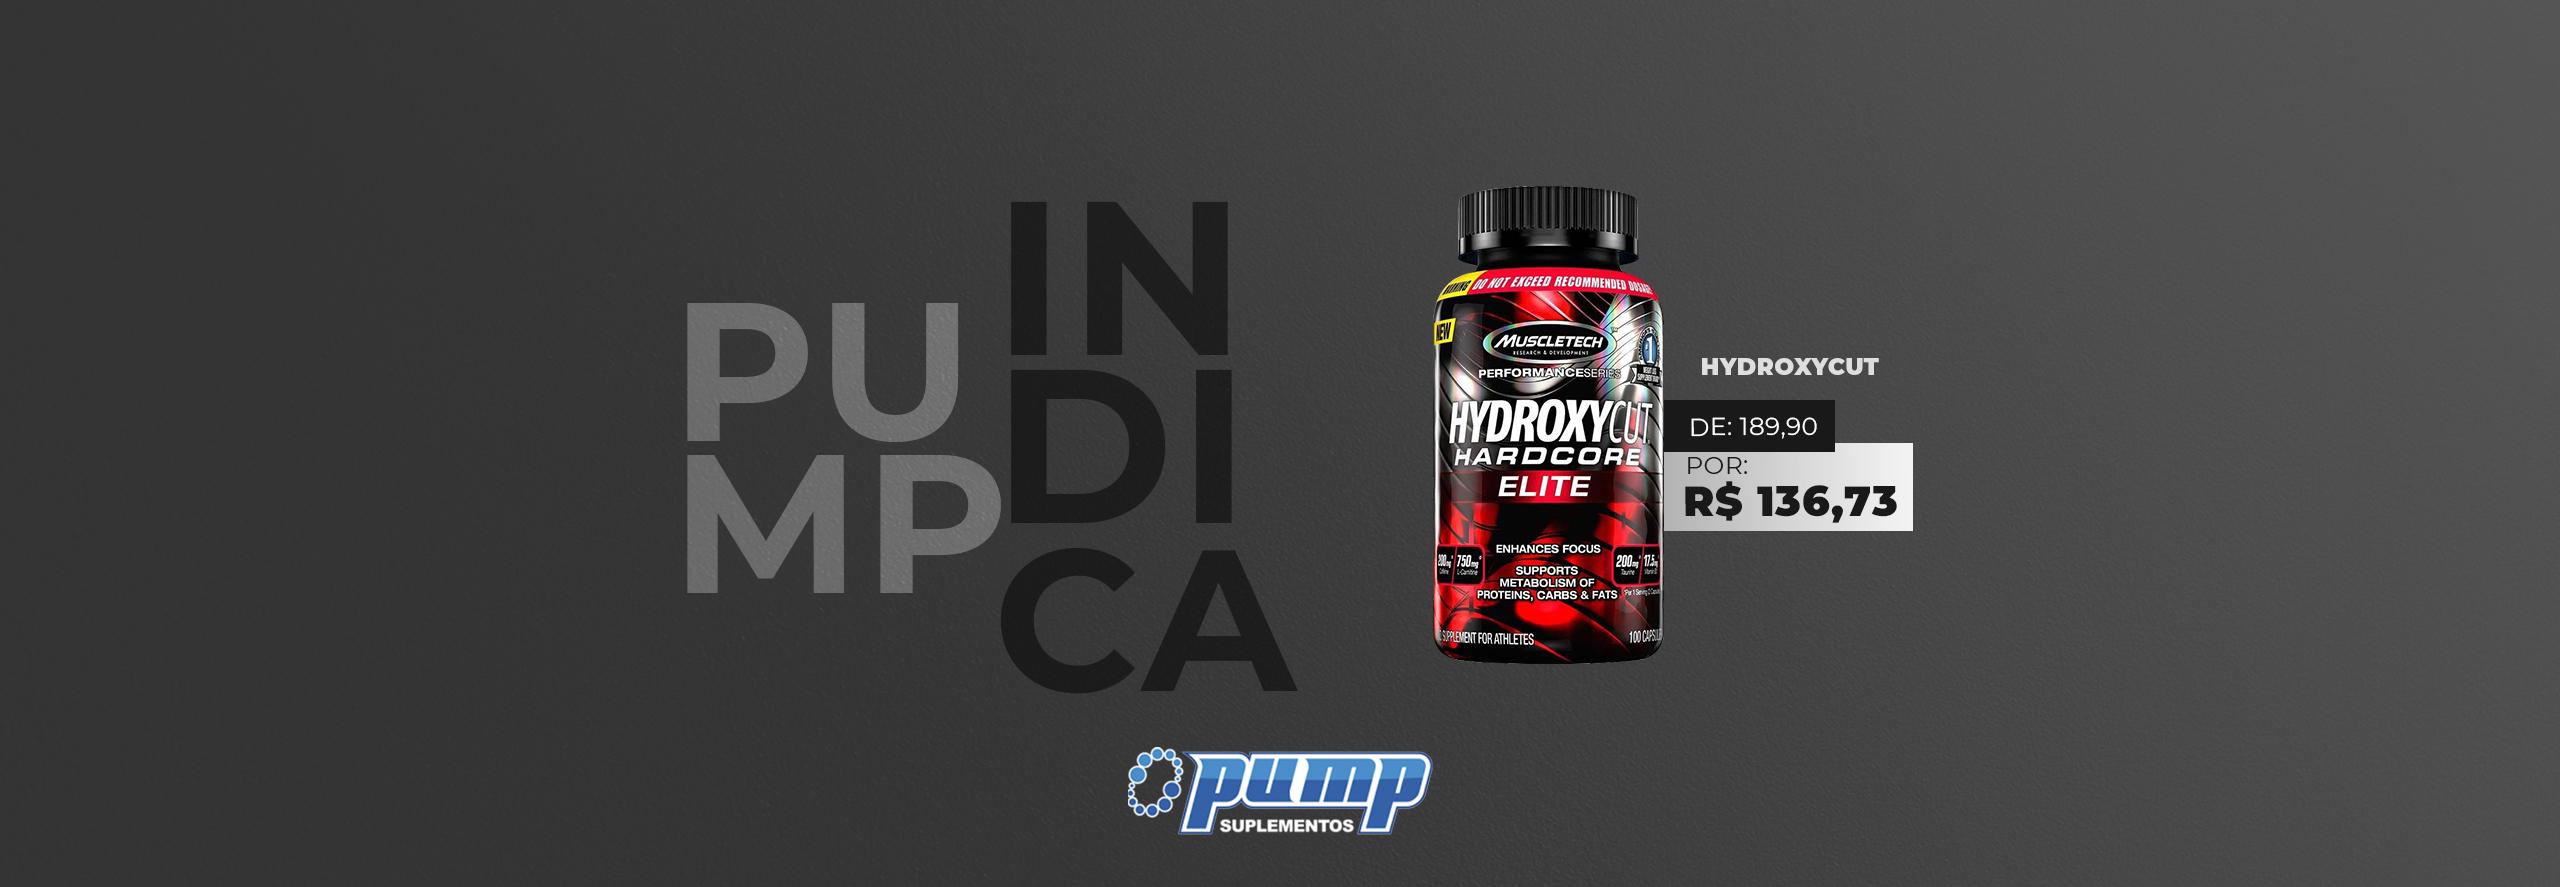 #Pump Indica (Hydroxycut)